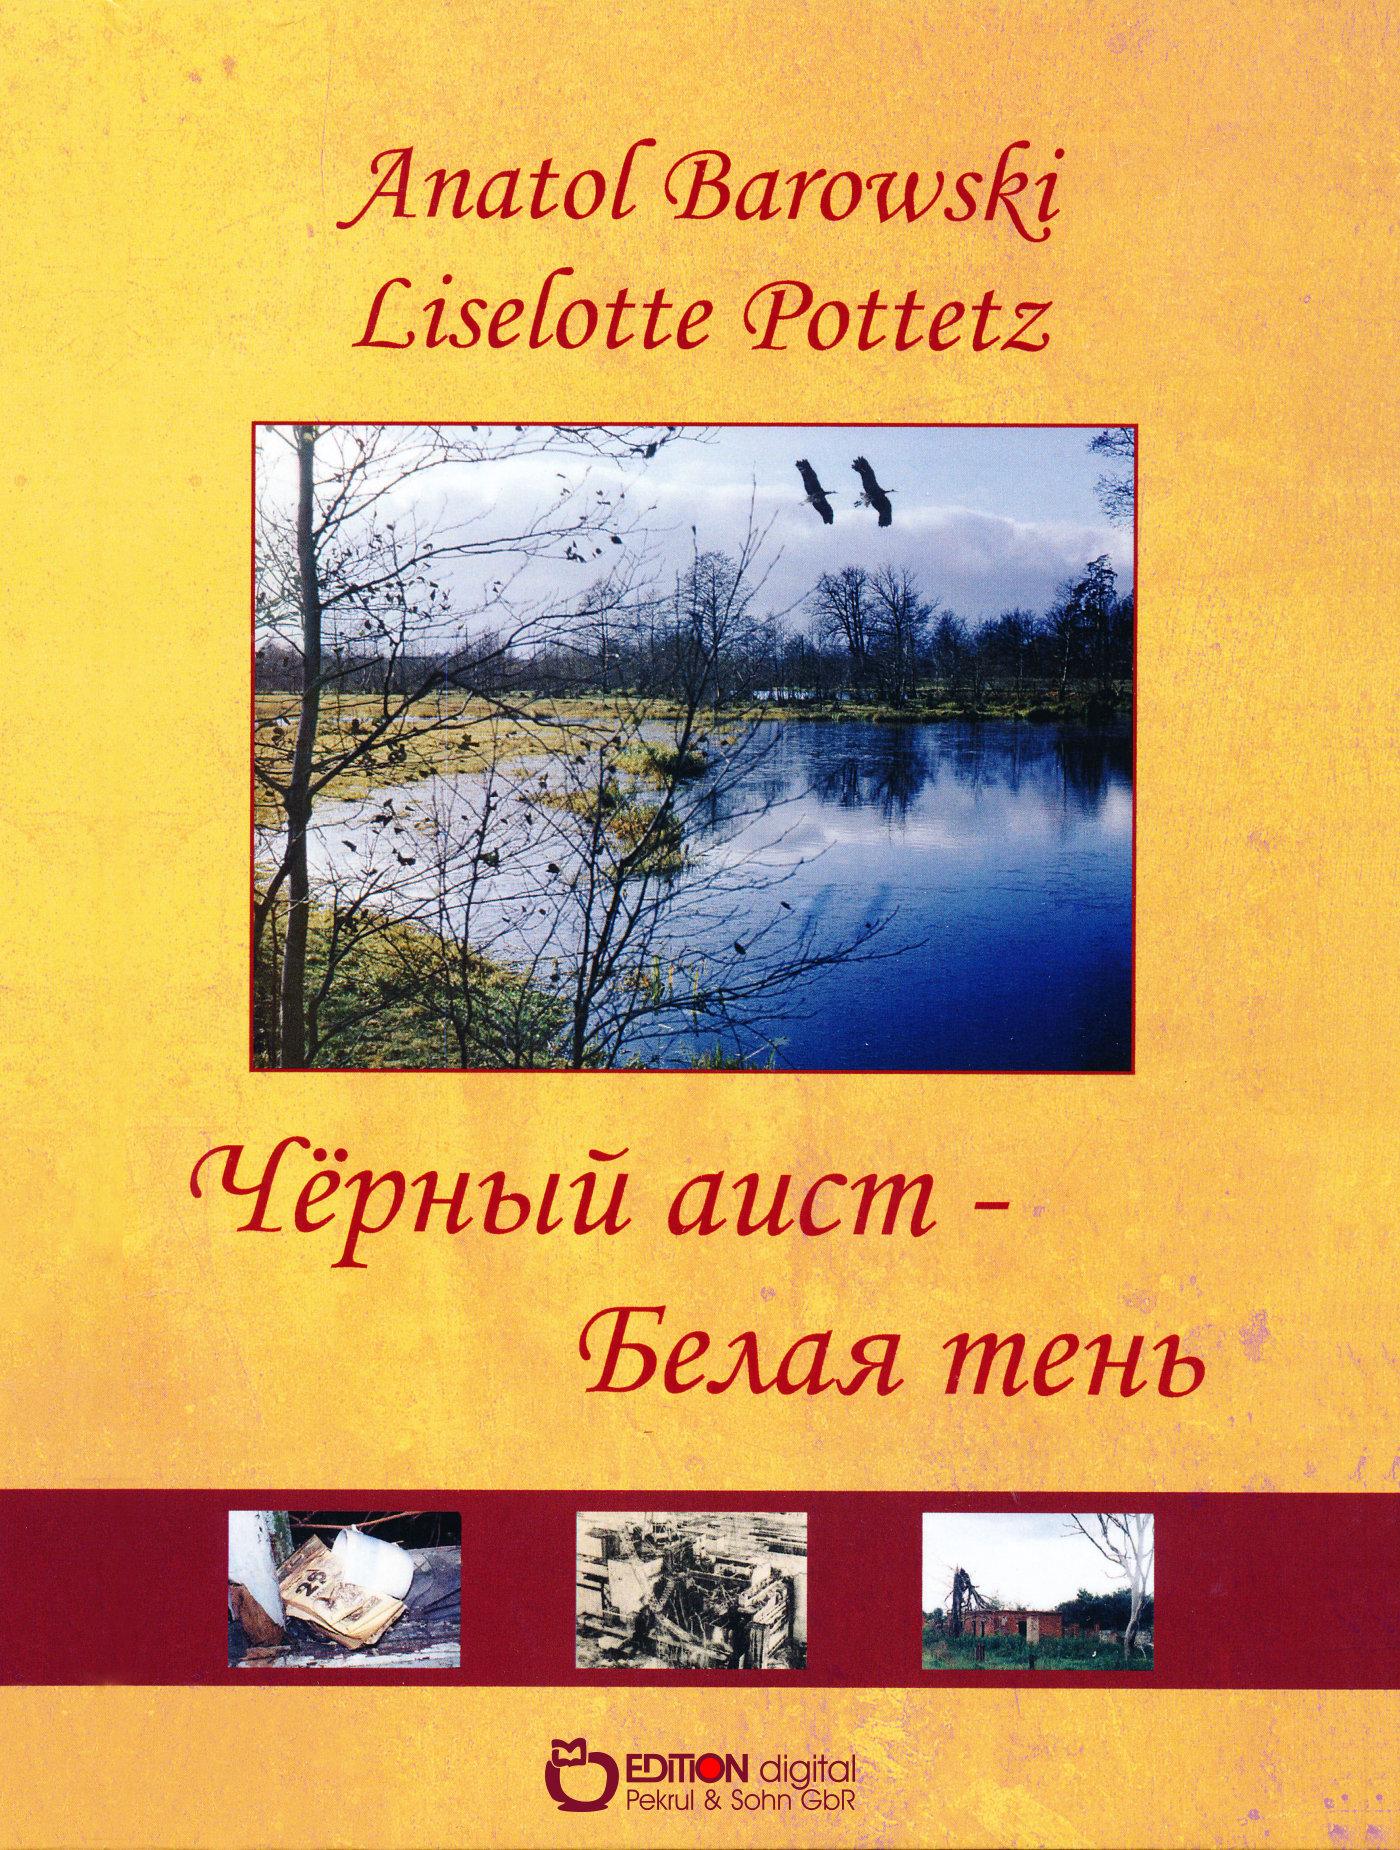 Чёрныйаист von Liselotte Pottetz, Anatol Barowski